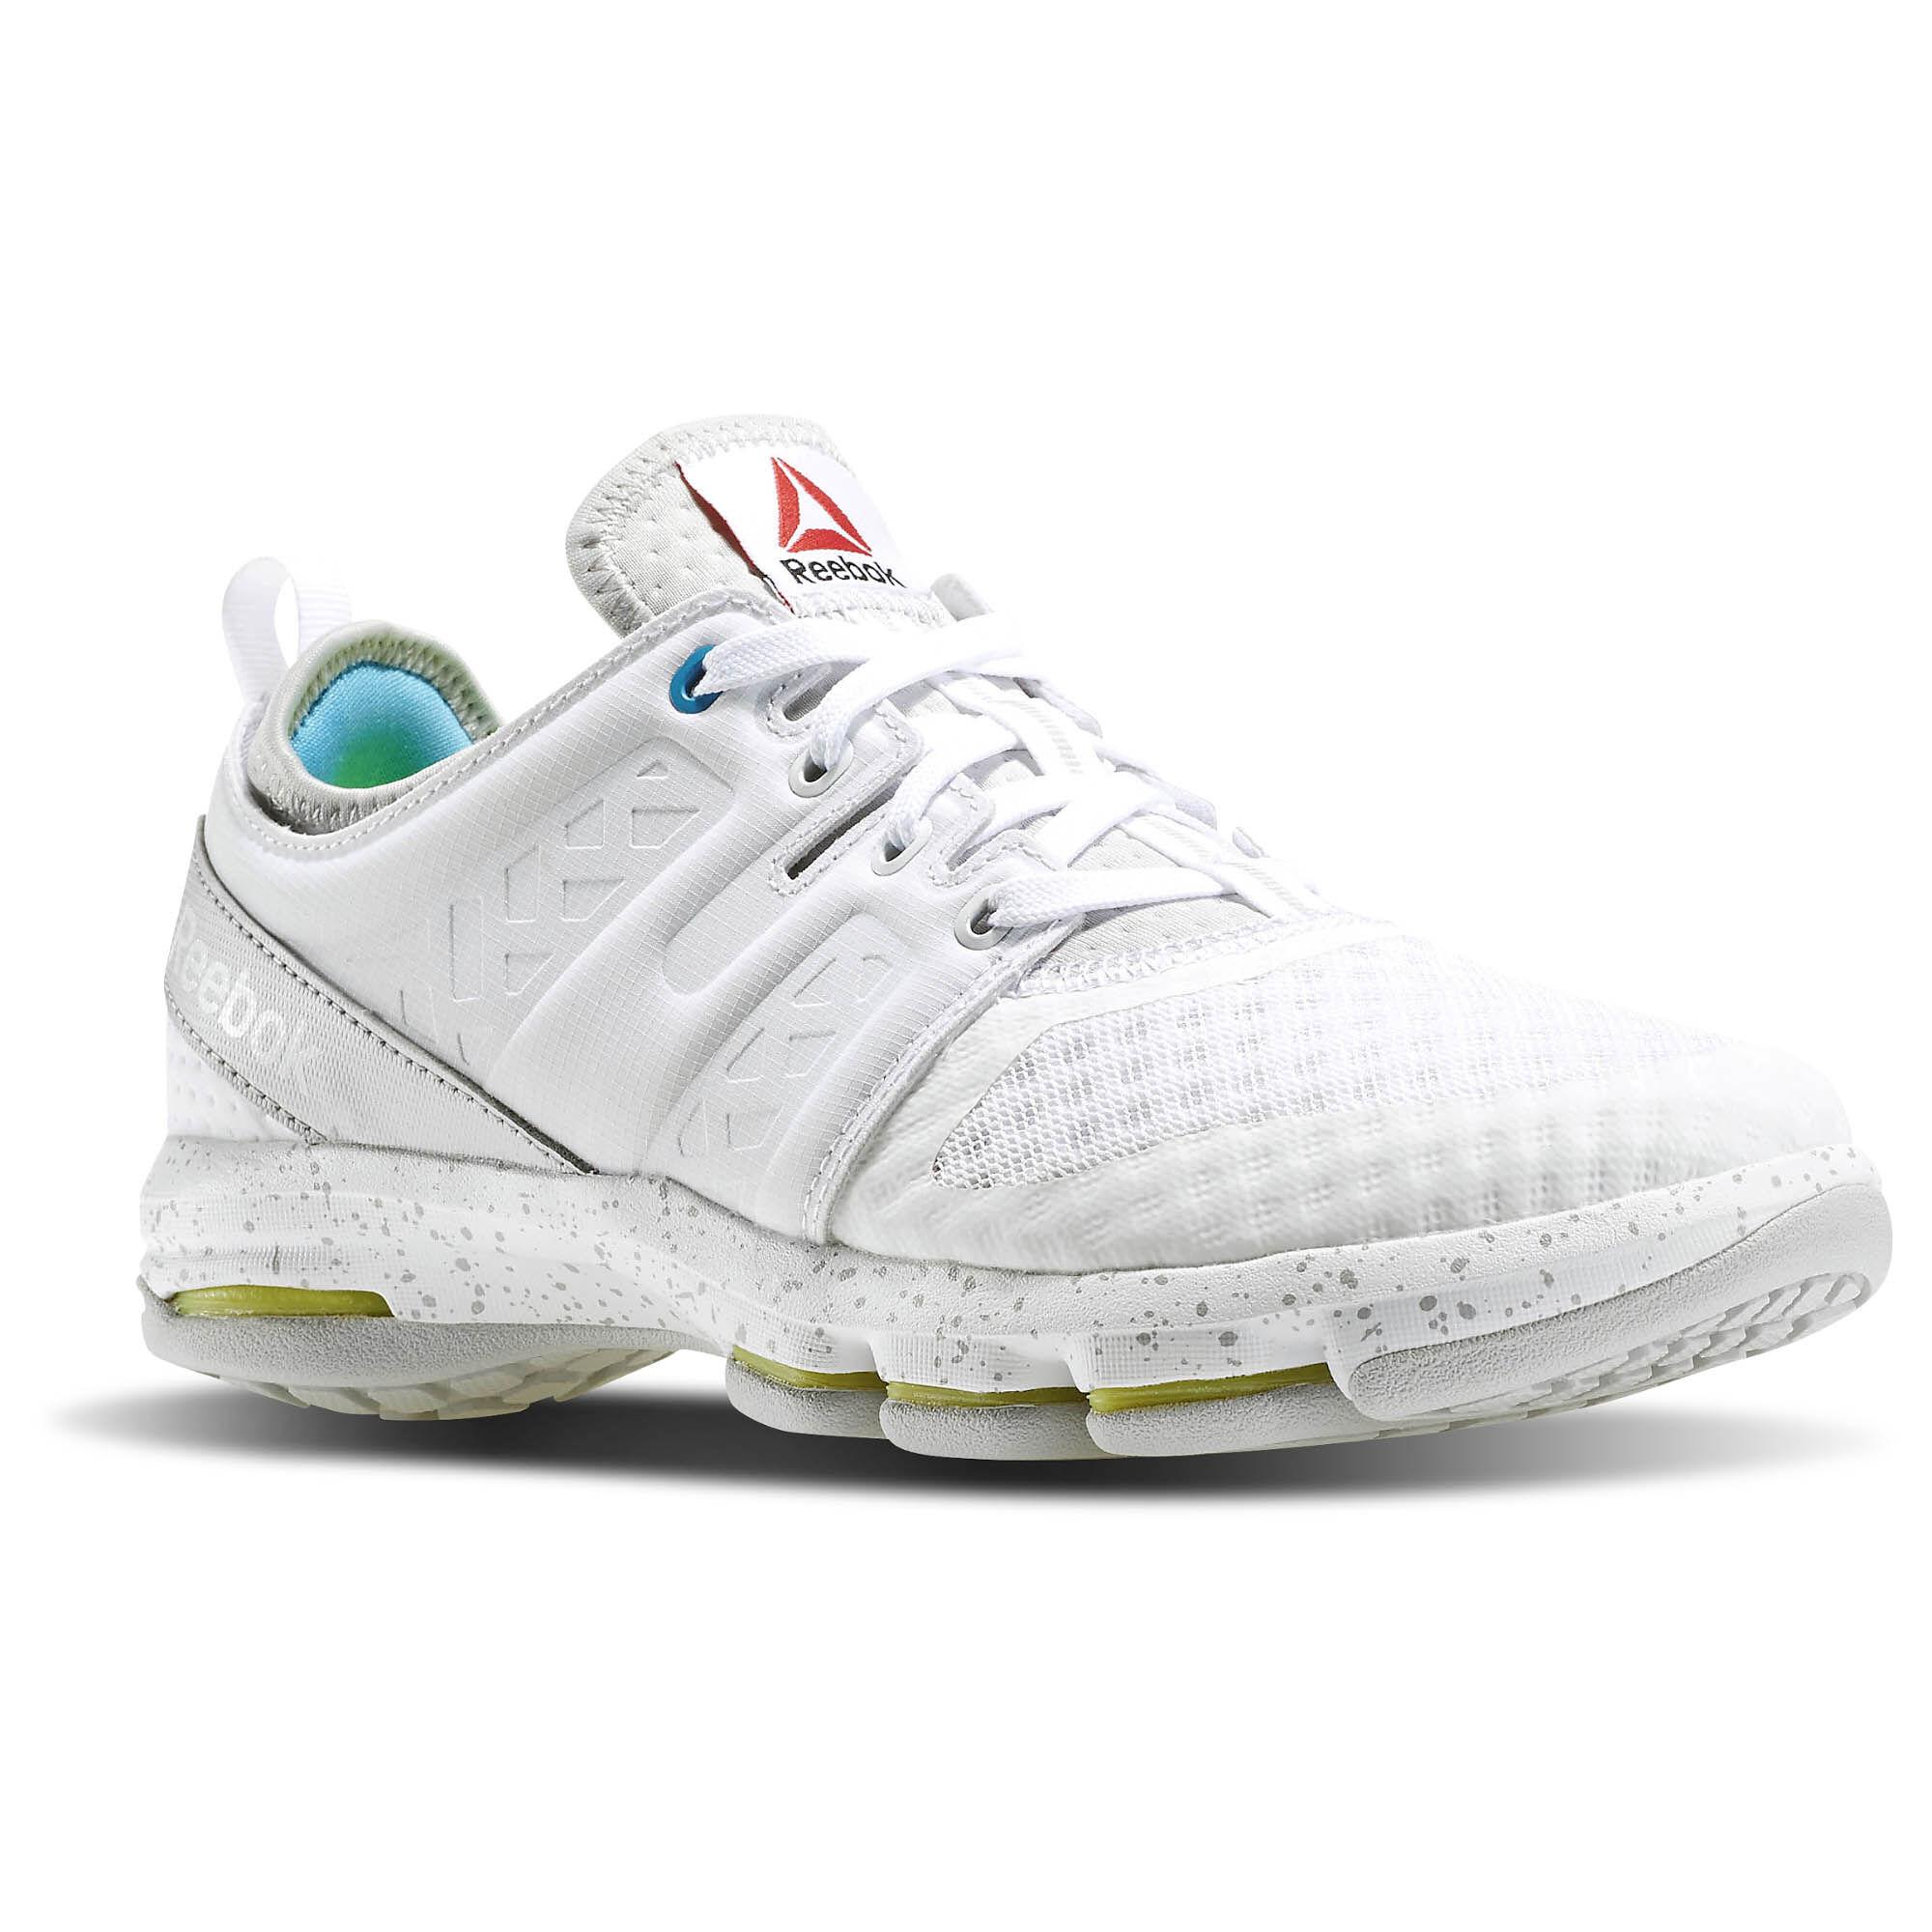 71ab3b93b42250 Buy reebok tennis ball shoes   OFF57% Discounted